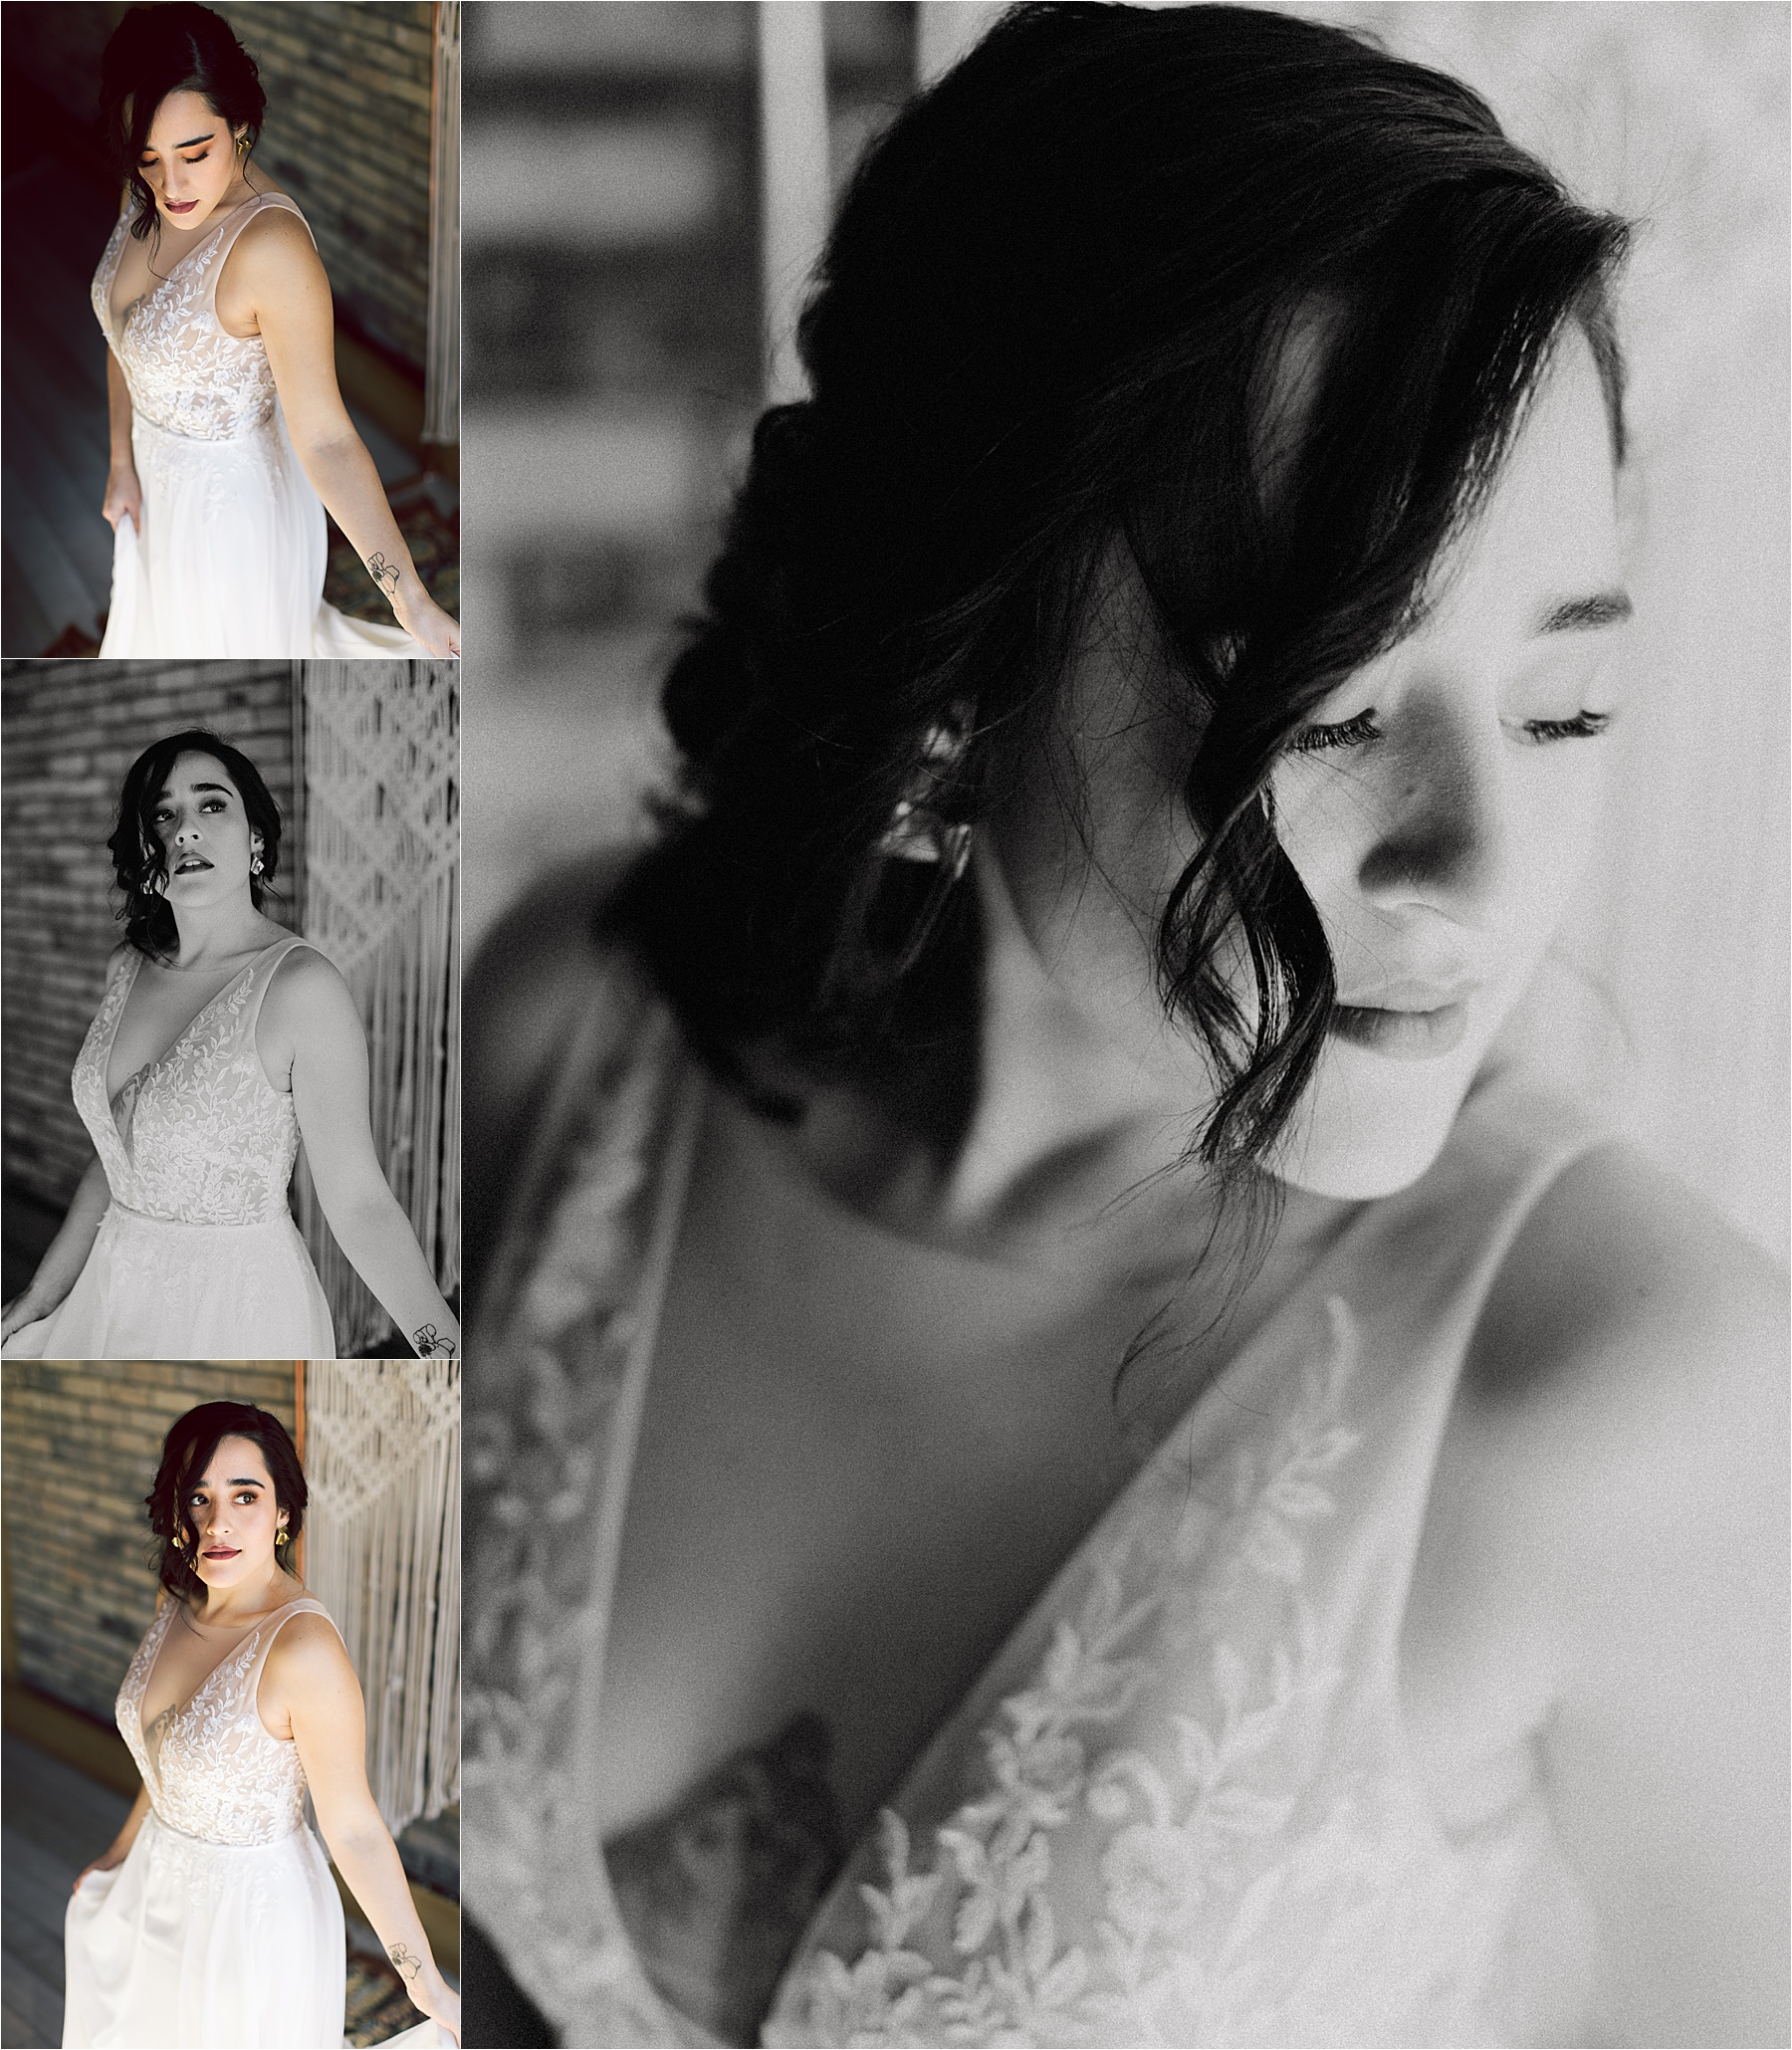 Florals:  Willow Design  / Dress:  Miss Ruby Boutique  / Macrame:  Wannabe West Coast  / MUA:  Kelly Schubel  / Hairstyling: @rachelmarietillman